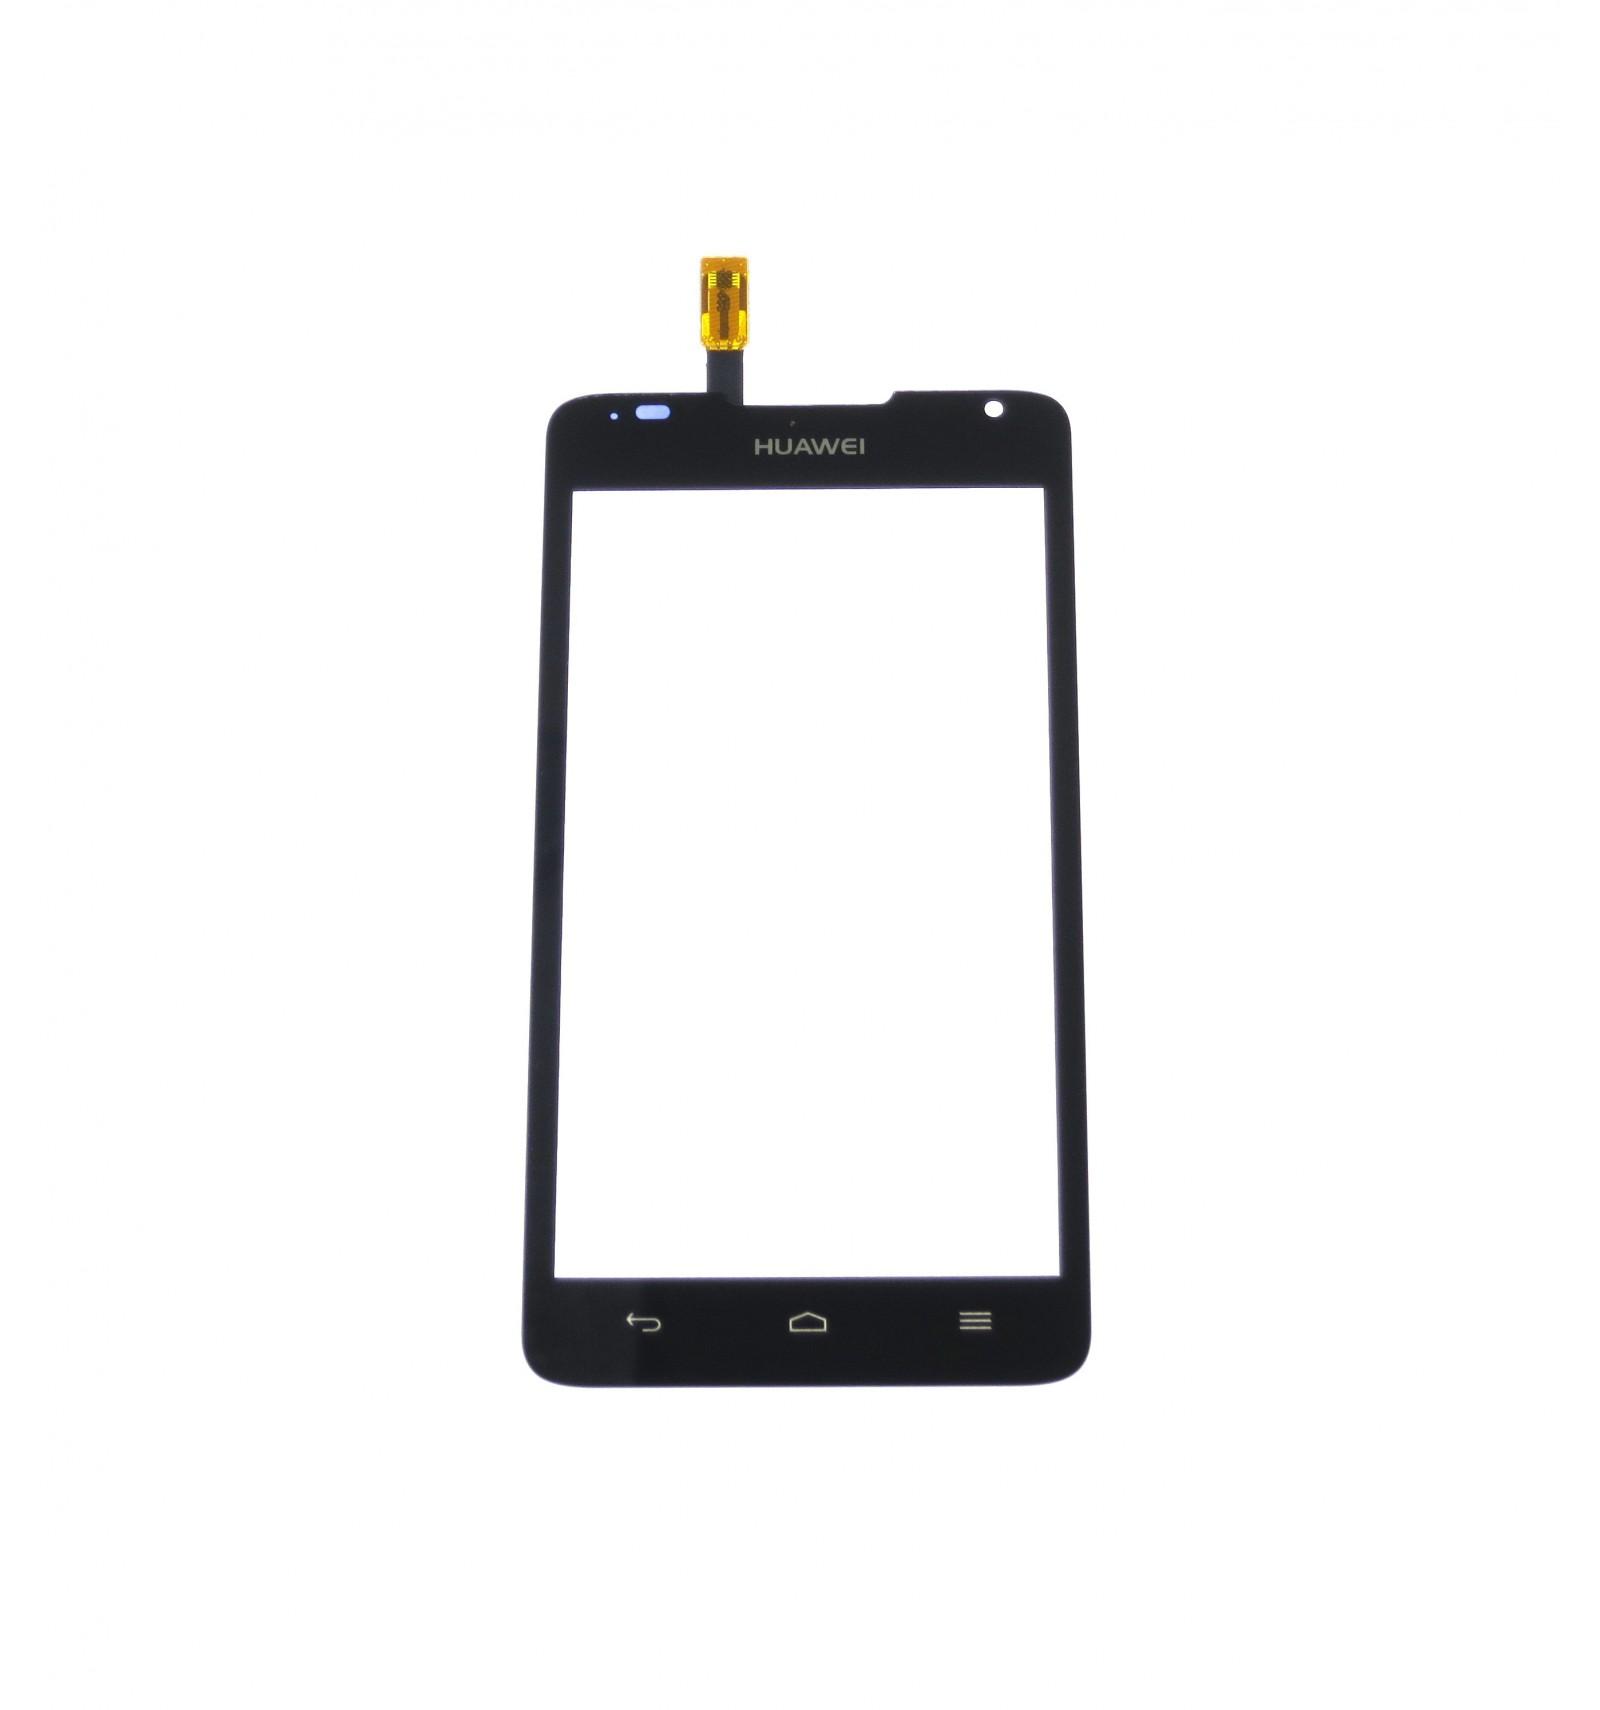 Huawei y530 service manual